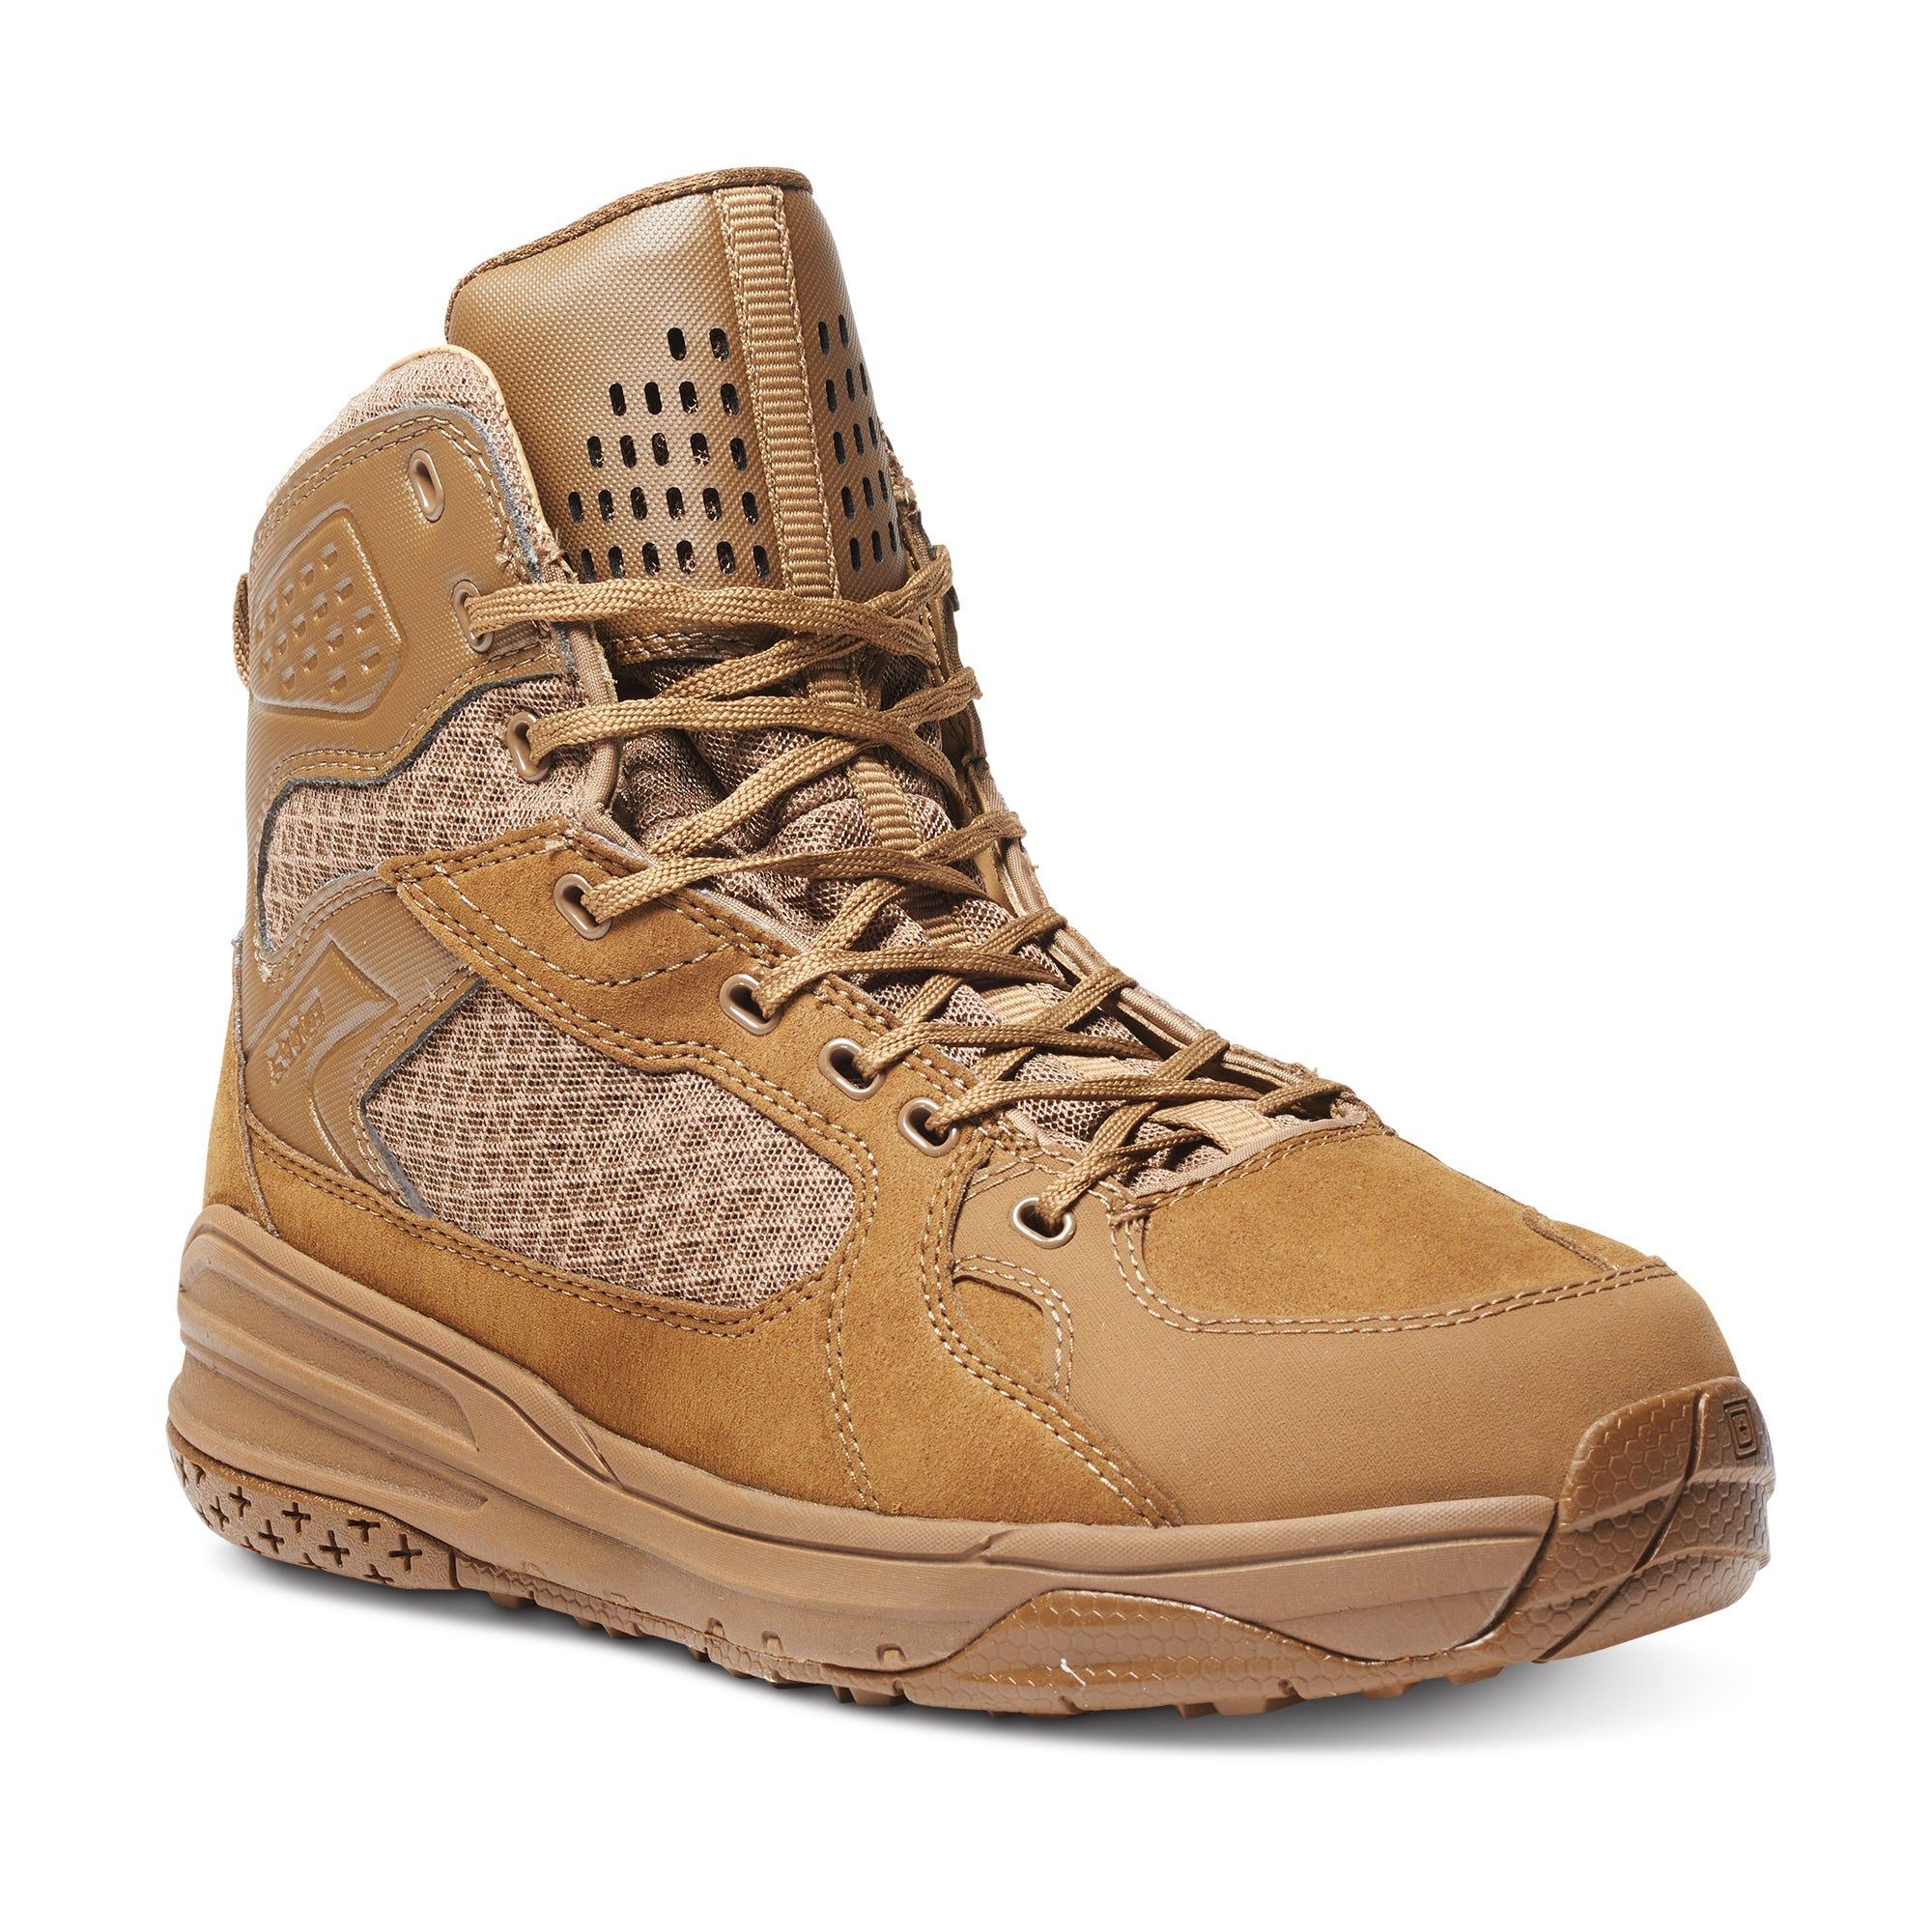 5.11 Tactical Men Halcyon Dark Coyote Tactical Boot (Khaki/Tan)